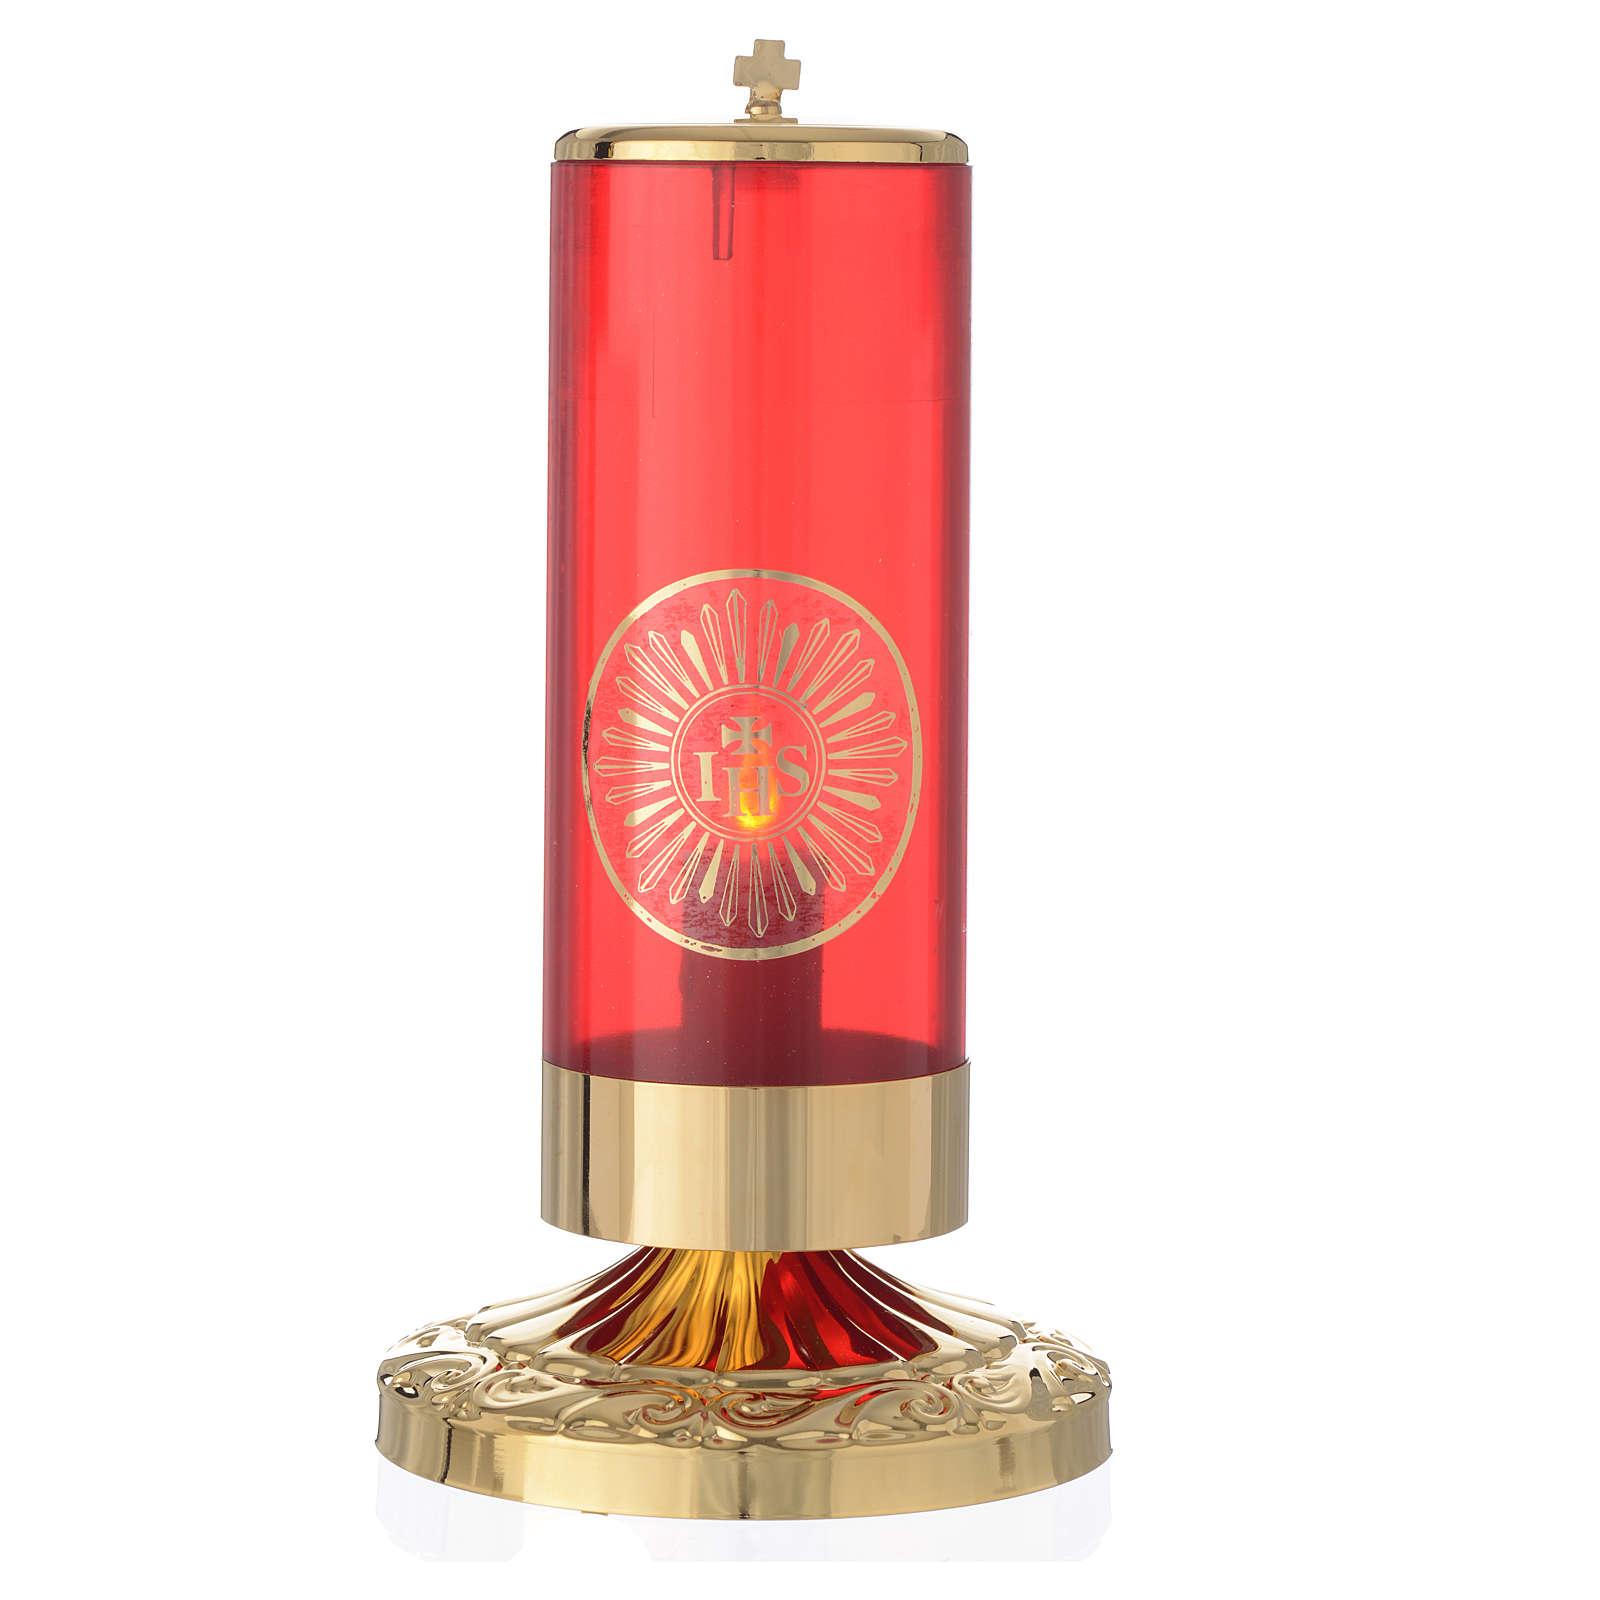 Lamparina Santíssimo estilo império eléctrica 3